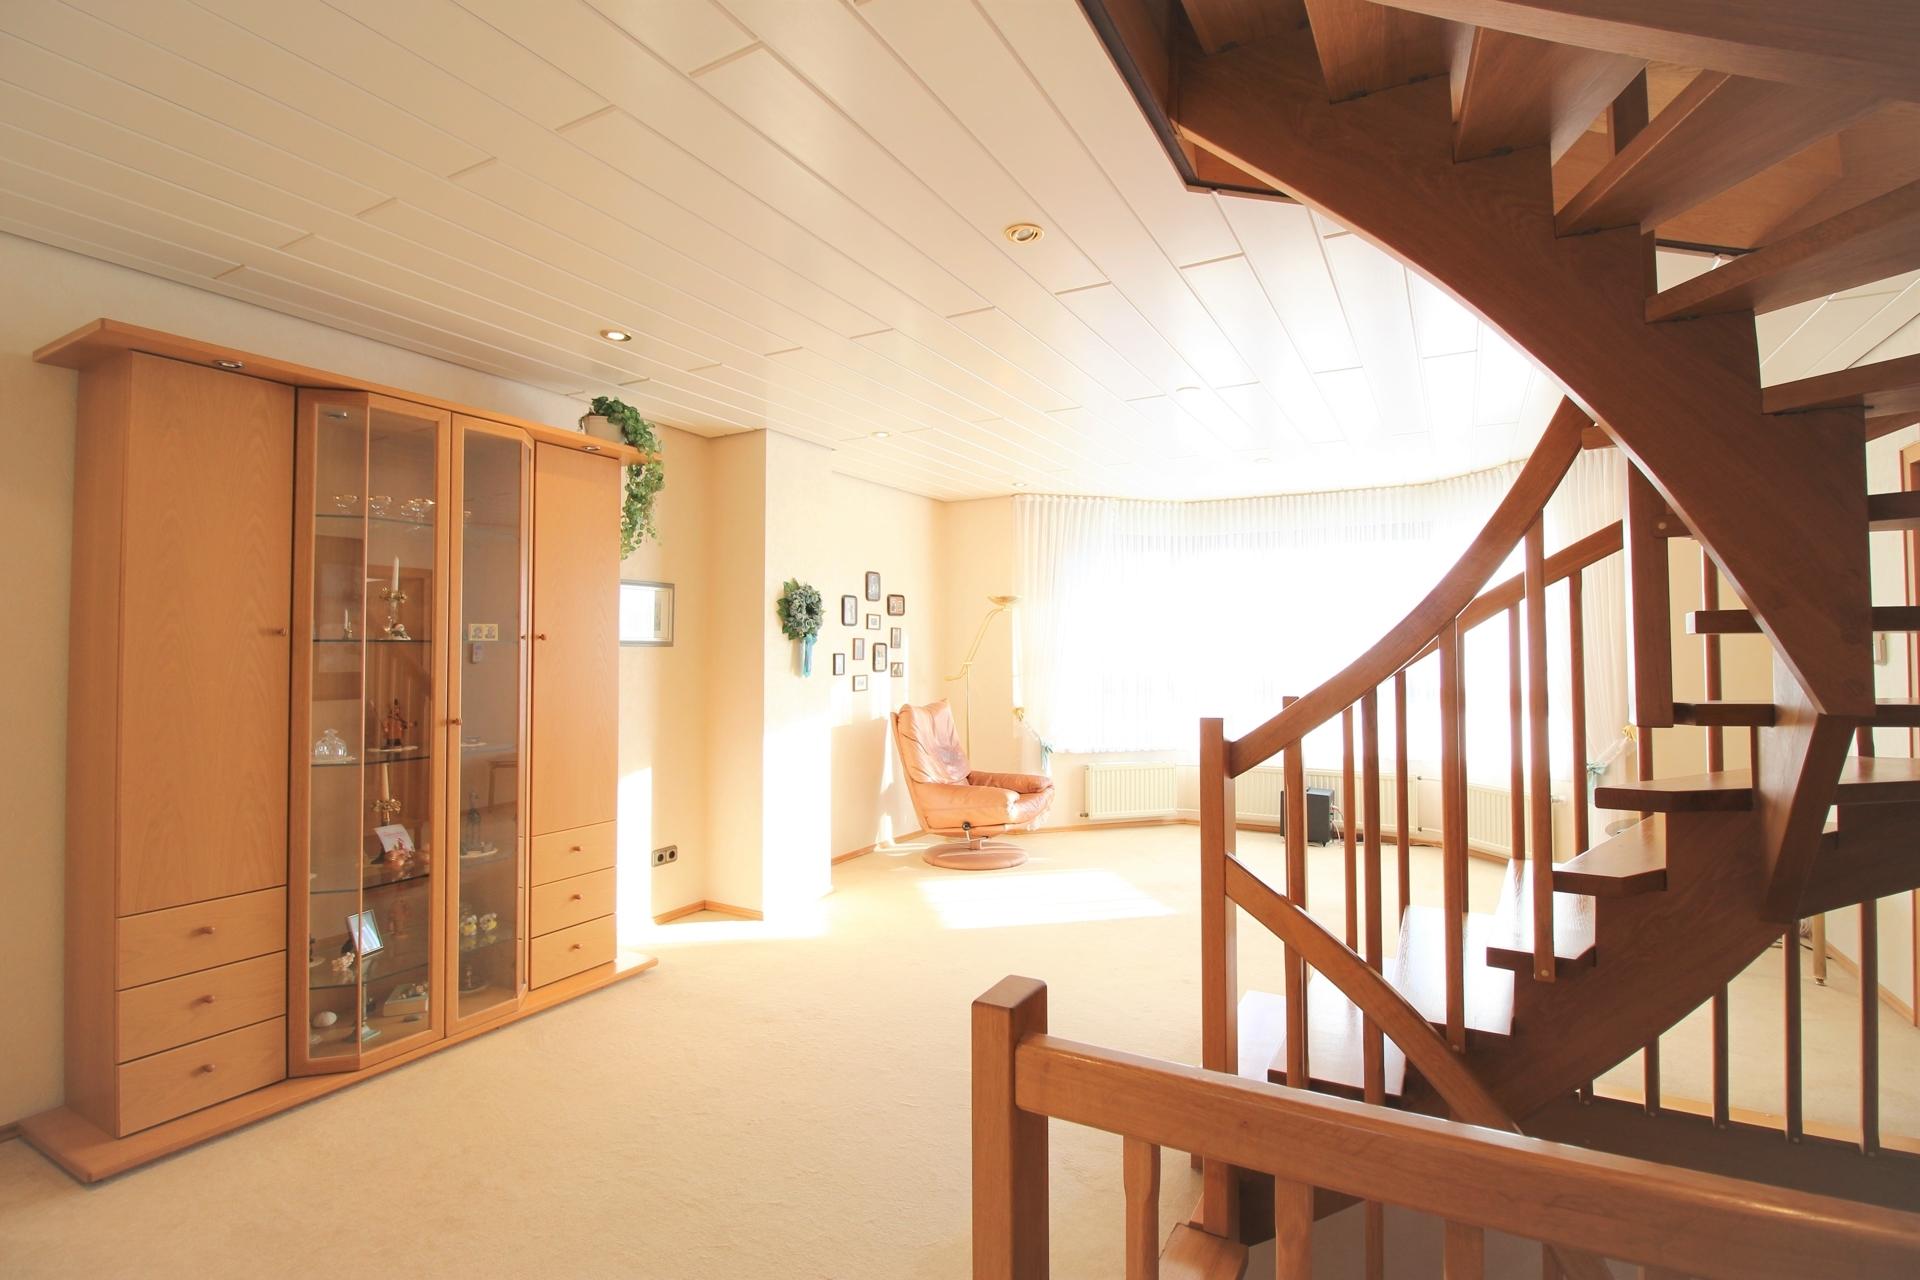 Wohnraum 4,91 m x 4,93 m